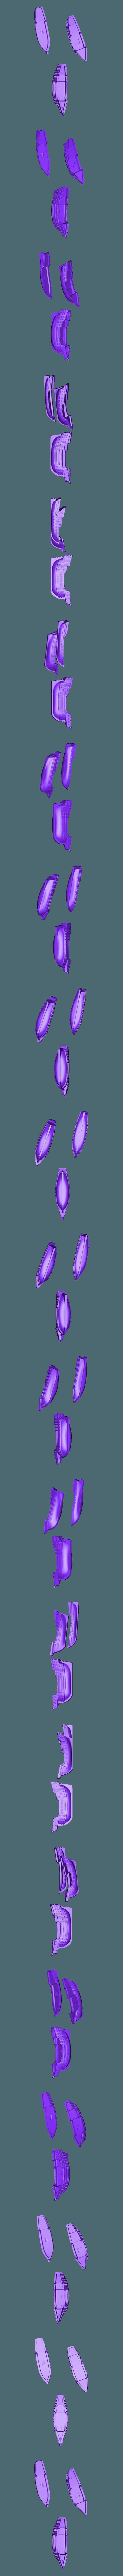 complete_rumpf.stl Download free STL file The ships of christopher columbus - scale 1/1000 • 3D print model, vandragon_de